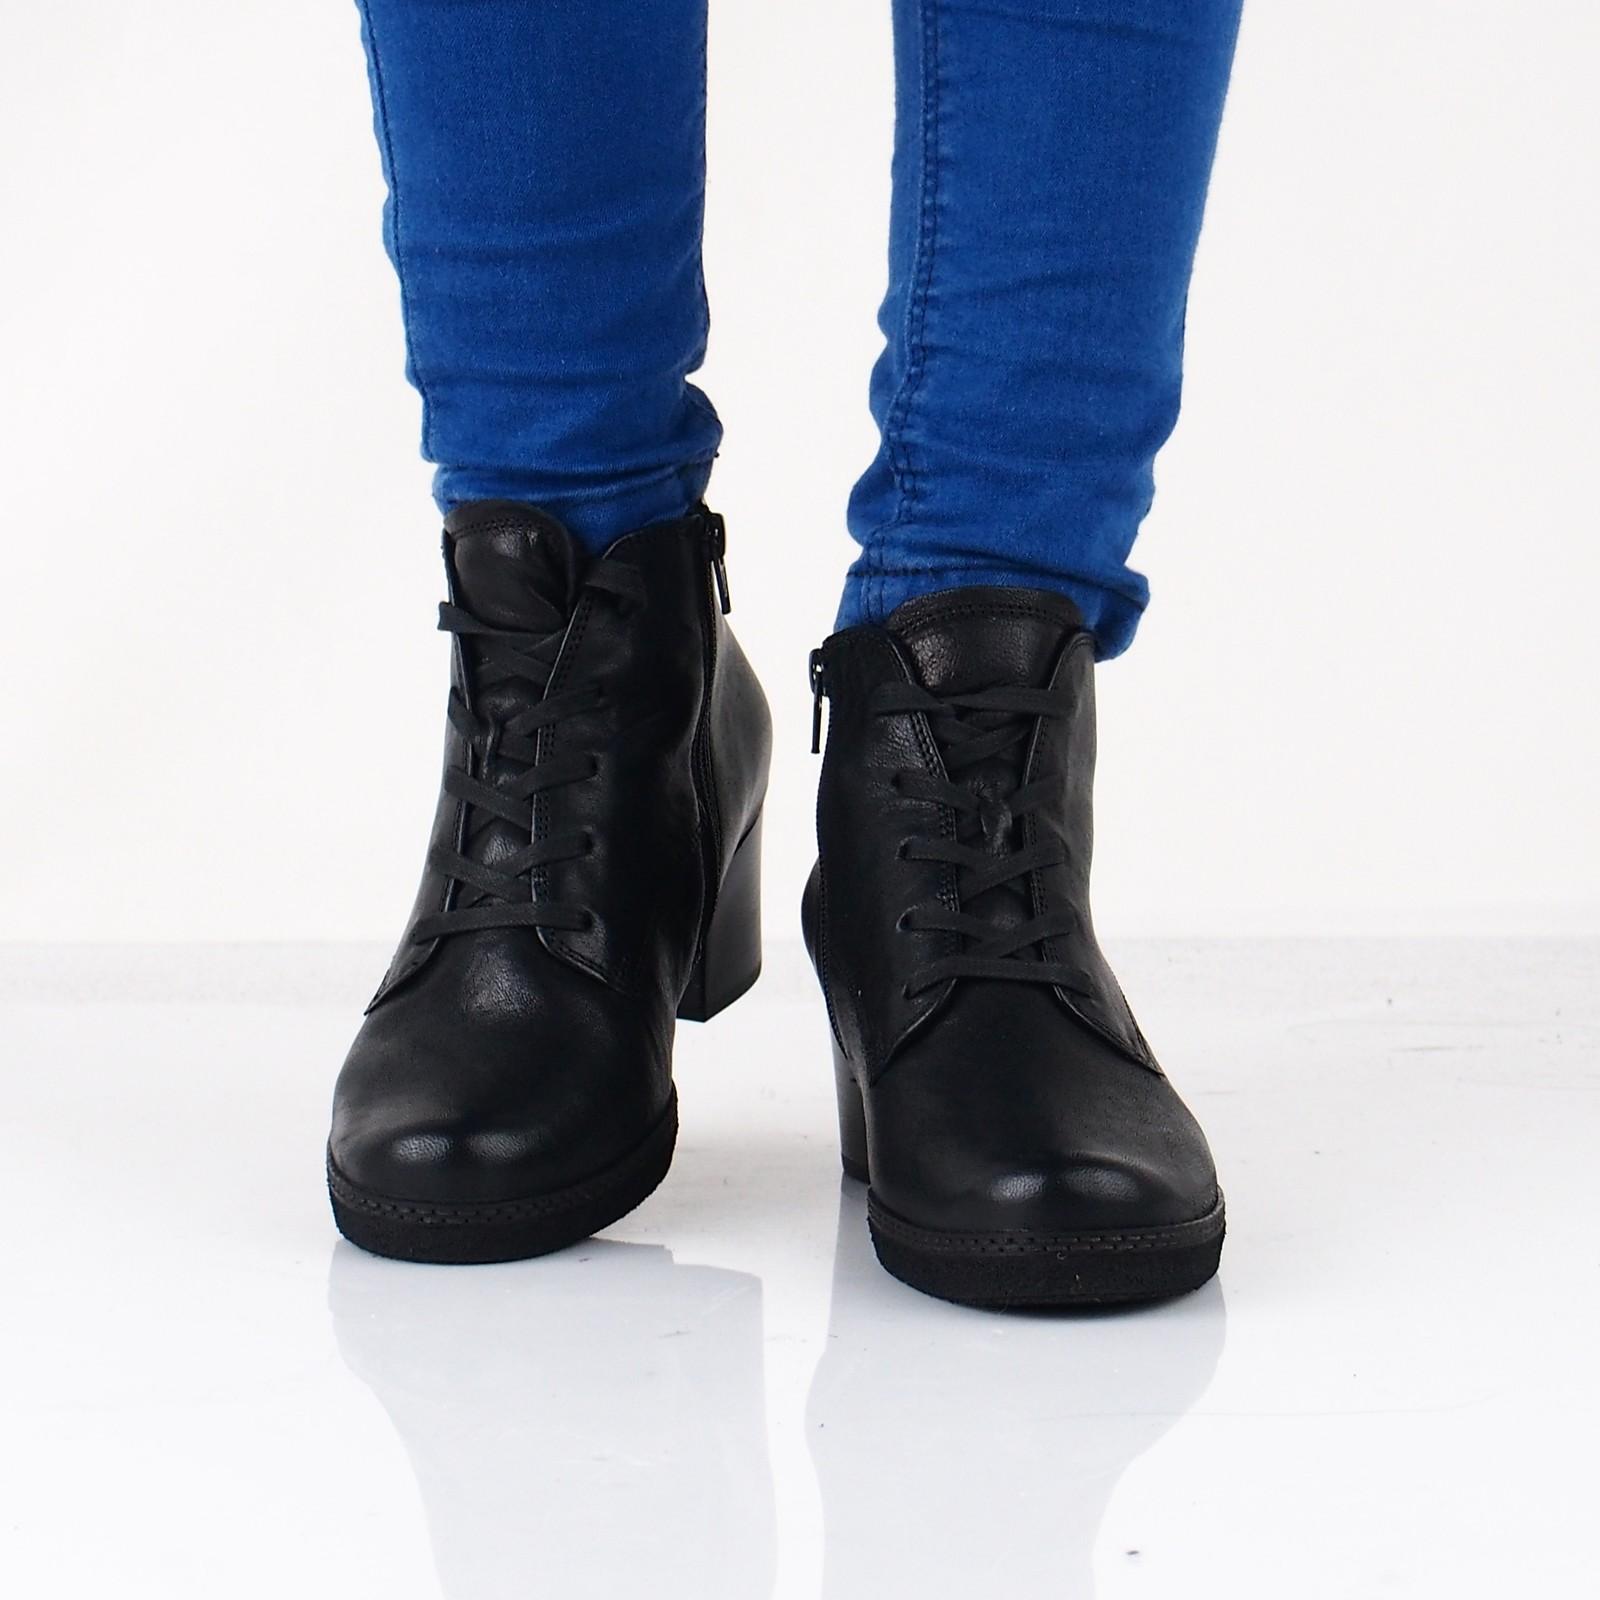 ... Gabor dámské kožené kotníkové boty - černé ... da2c7e0f8b